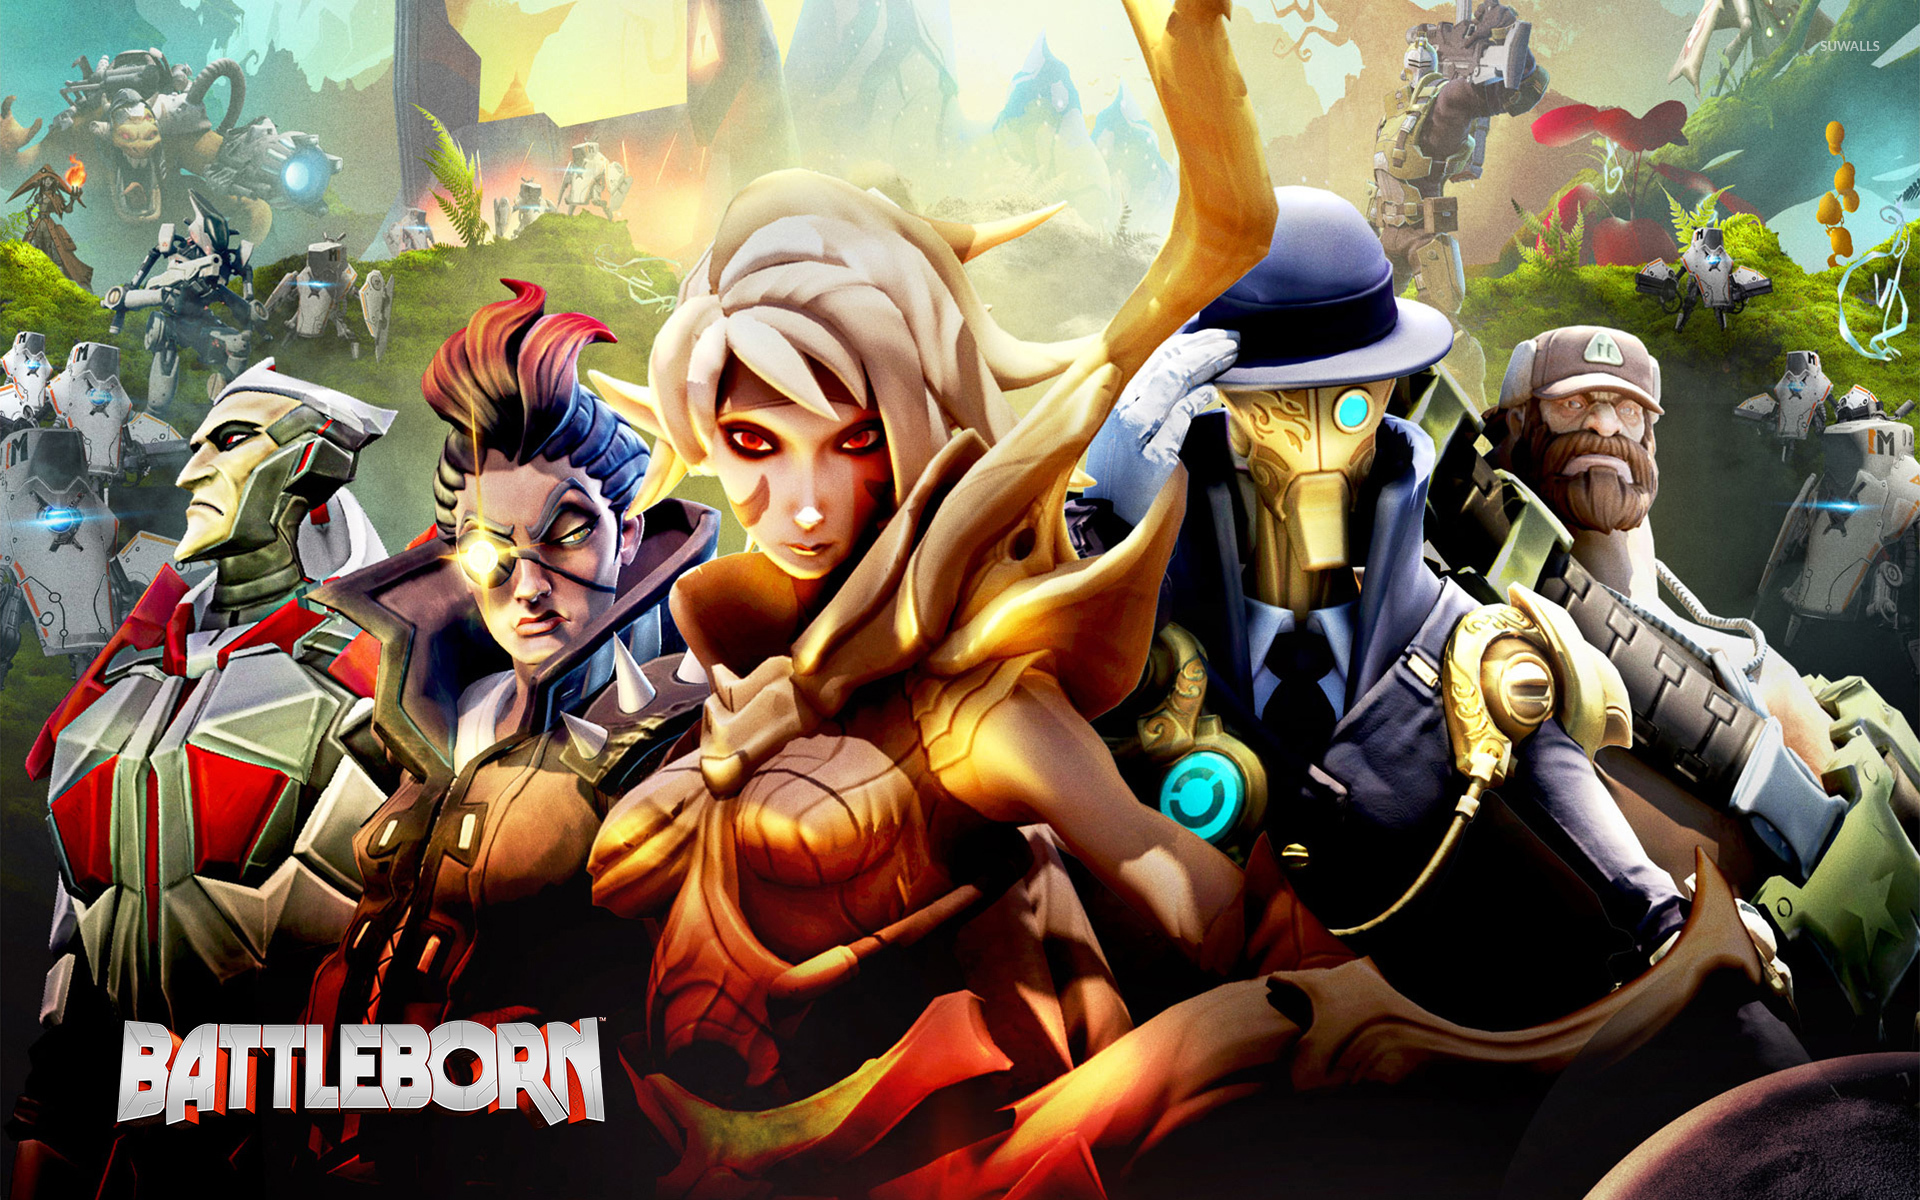 Battleborn Heroes Wallpaper Game Wallpapers 49576